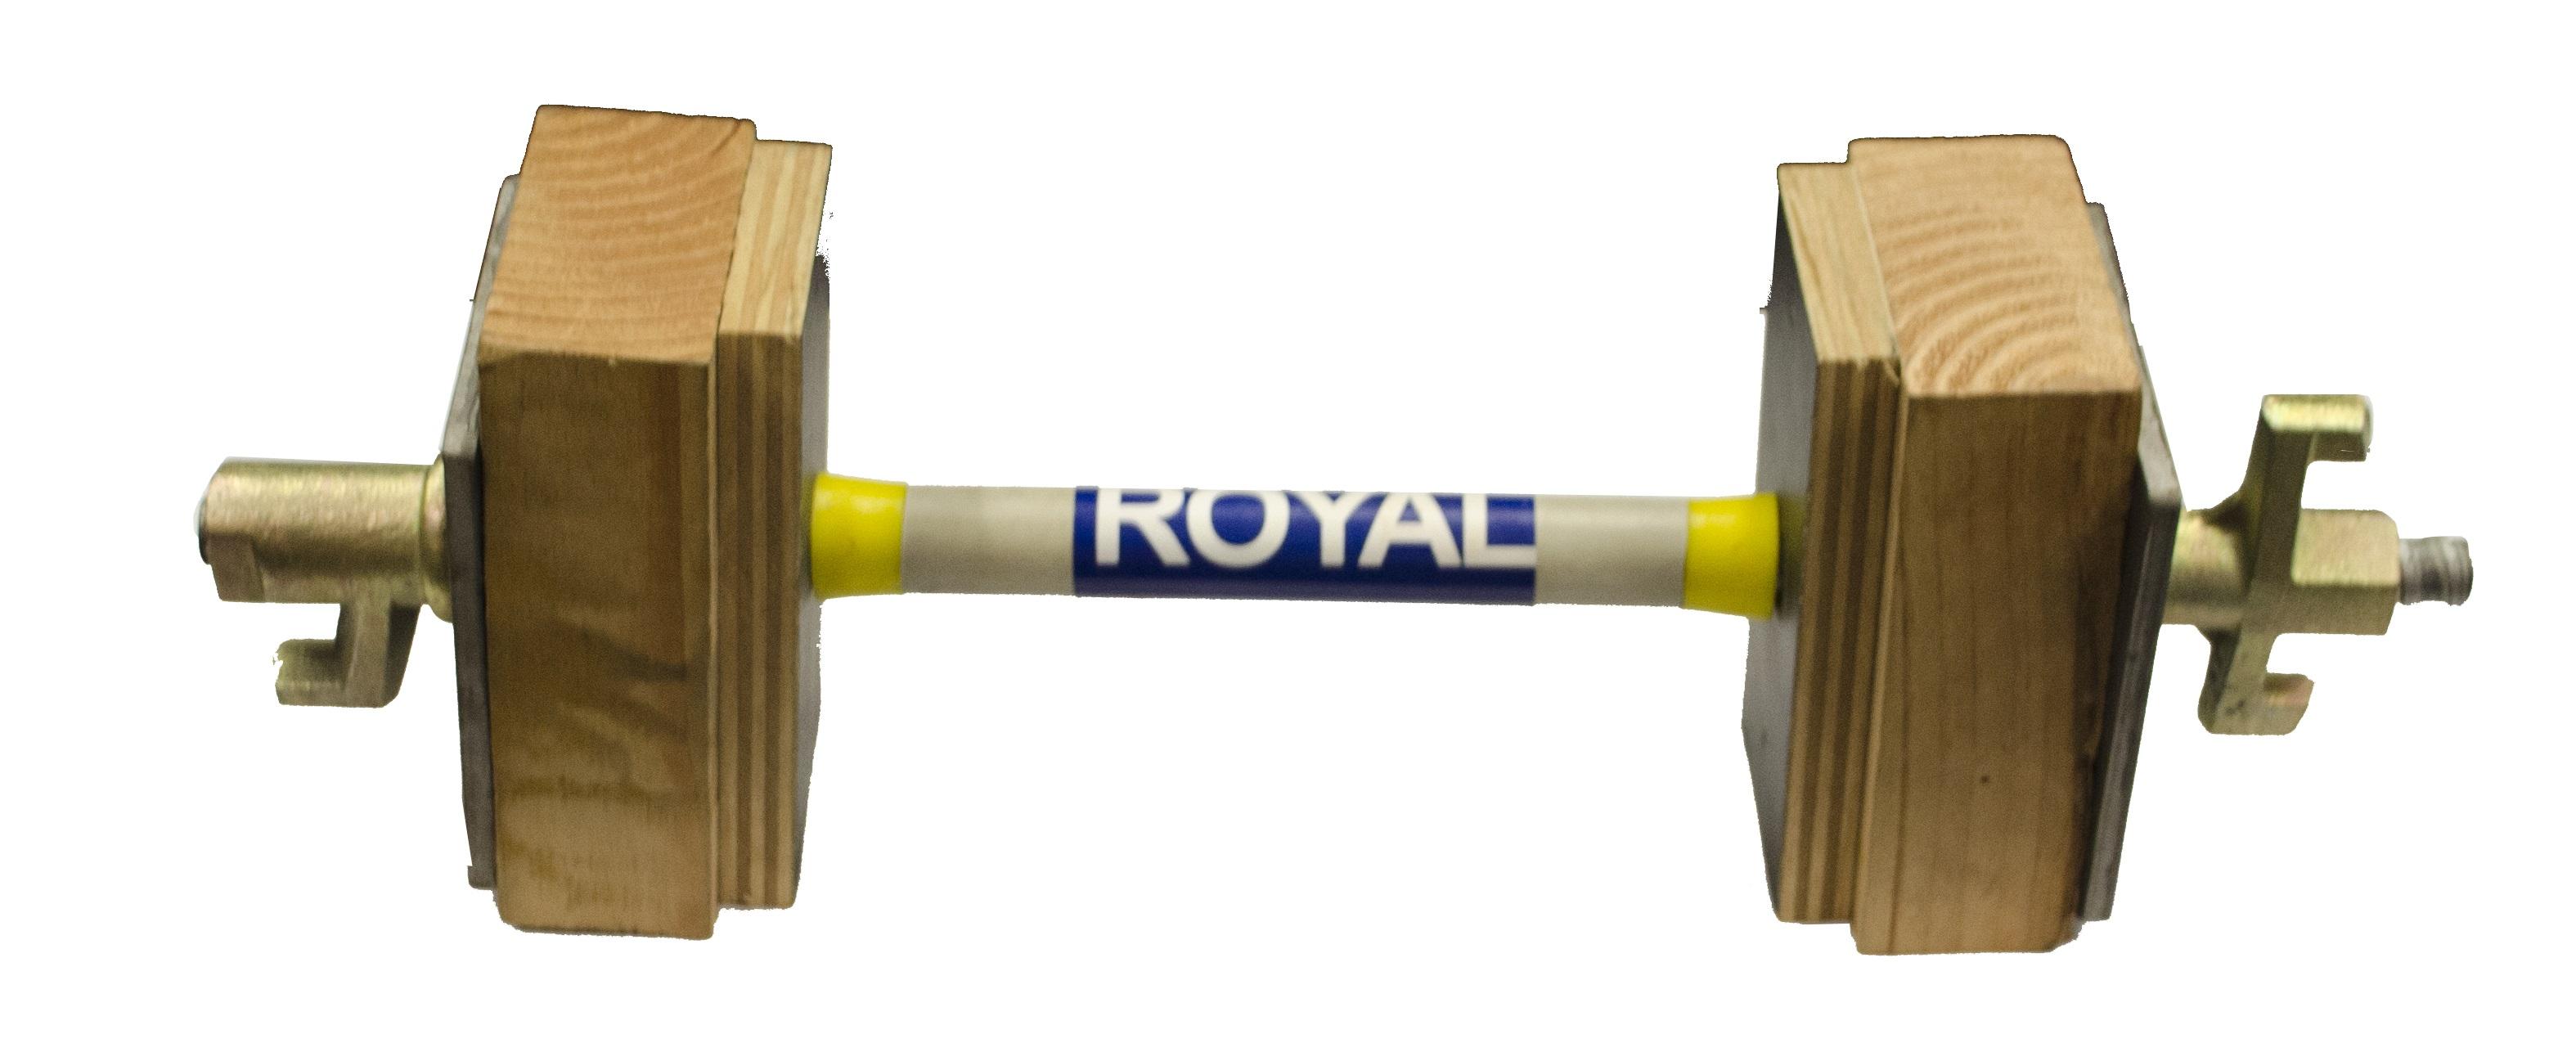 Royal Z Bar Formwork Systems Formwork Products